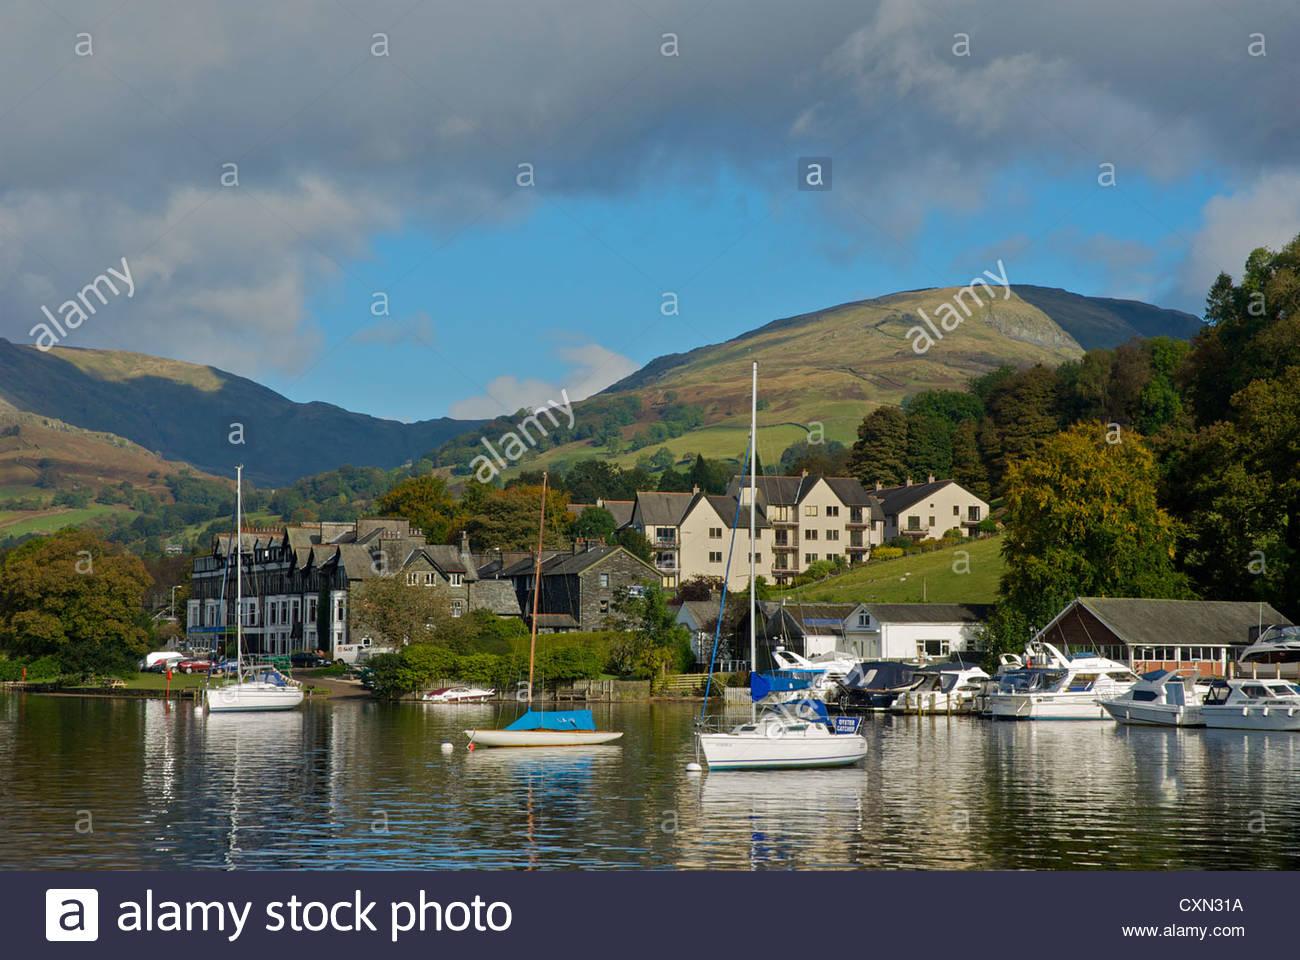 yachts-moored-on-lake-windermere-at-waterhead-lake-district-national-CXN31A-2.jpg